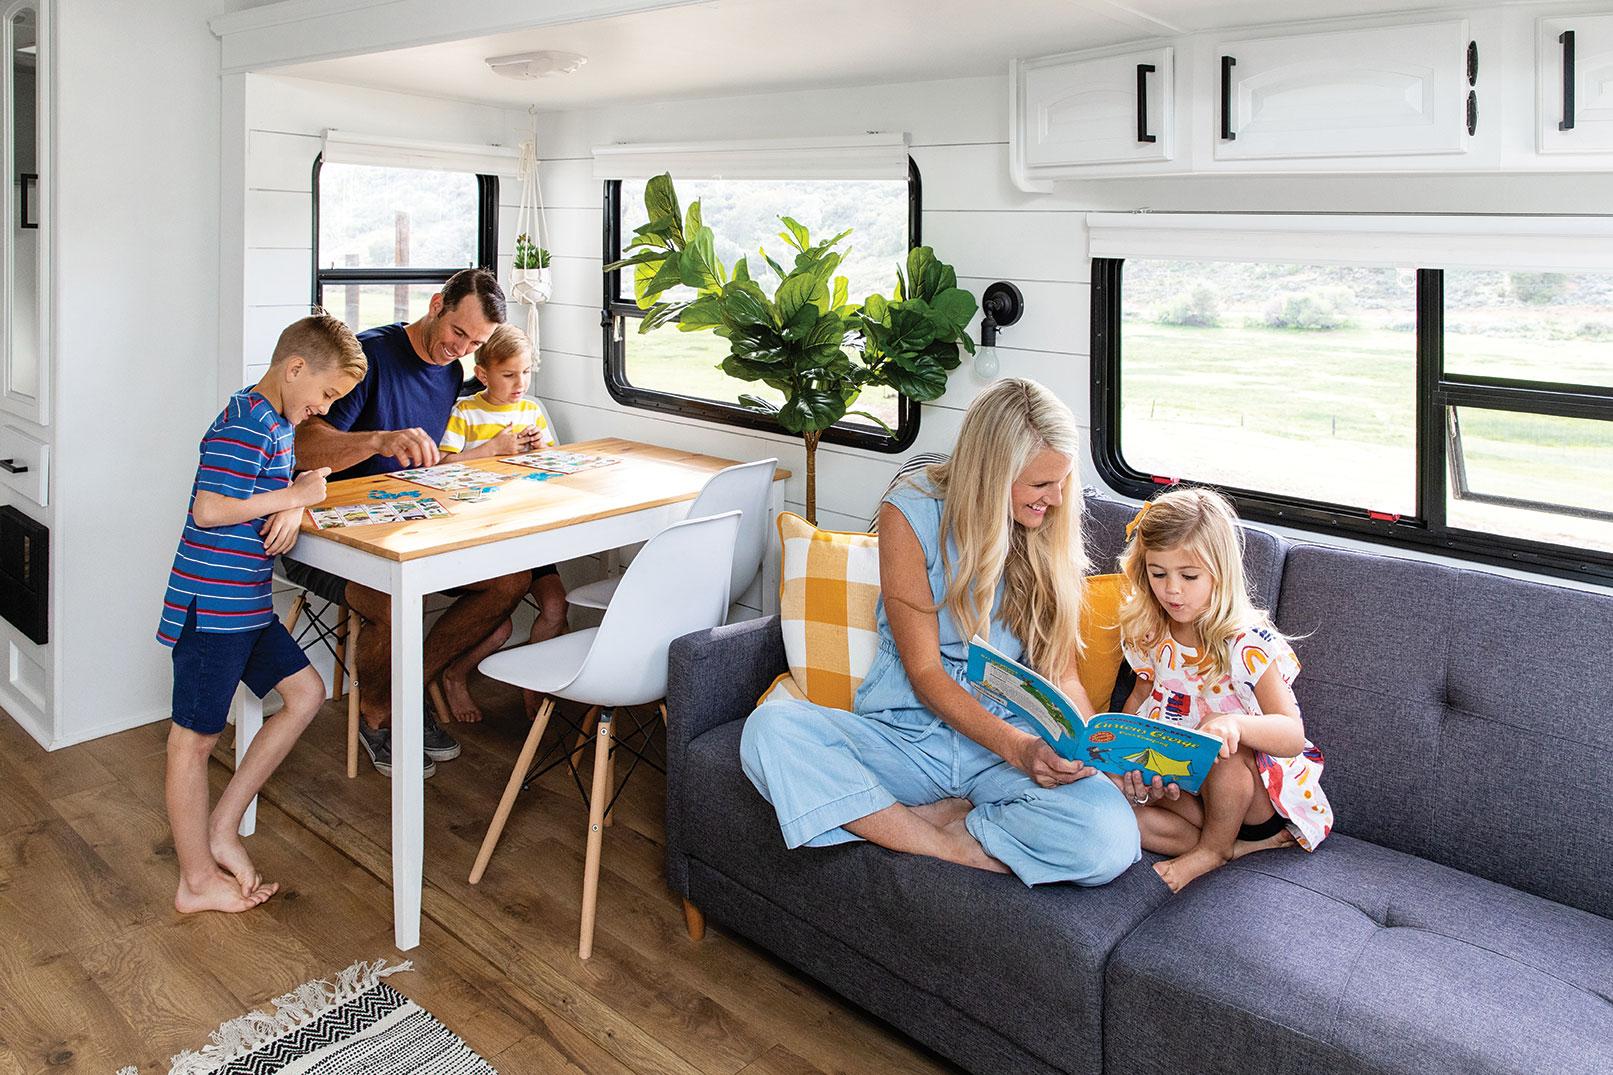 walker campers san diego RV trailer rental renovation